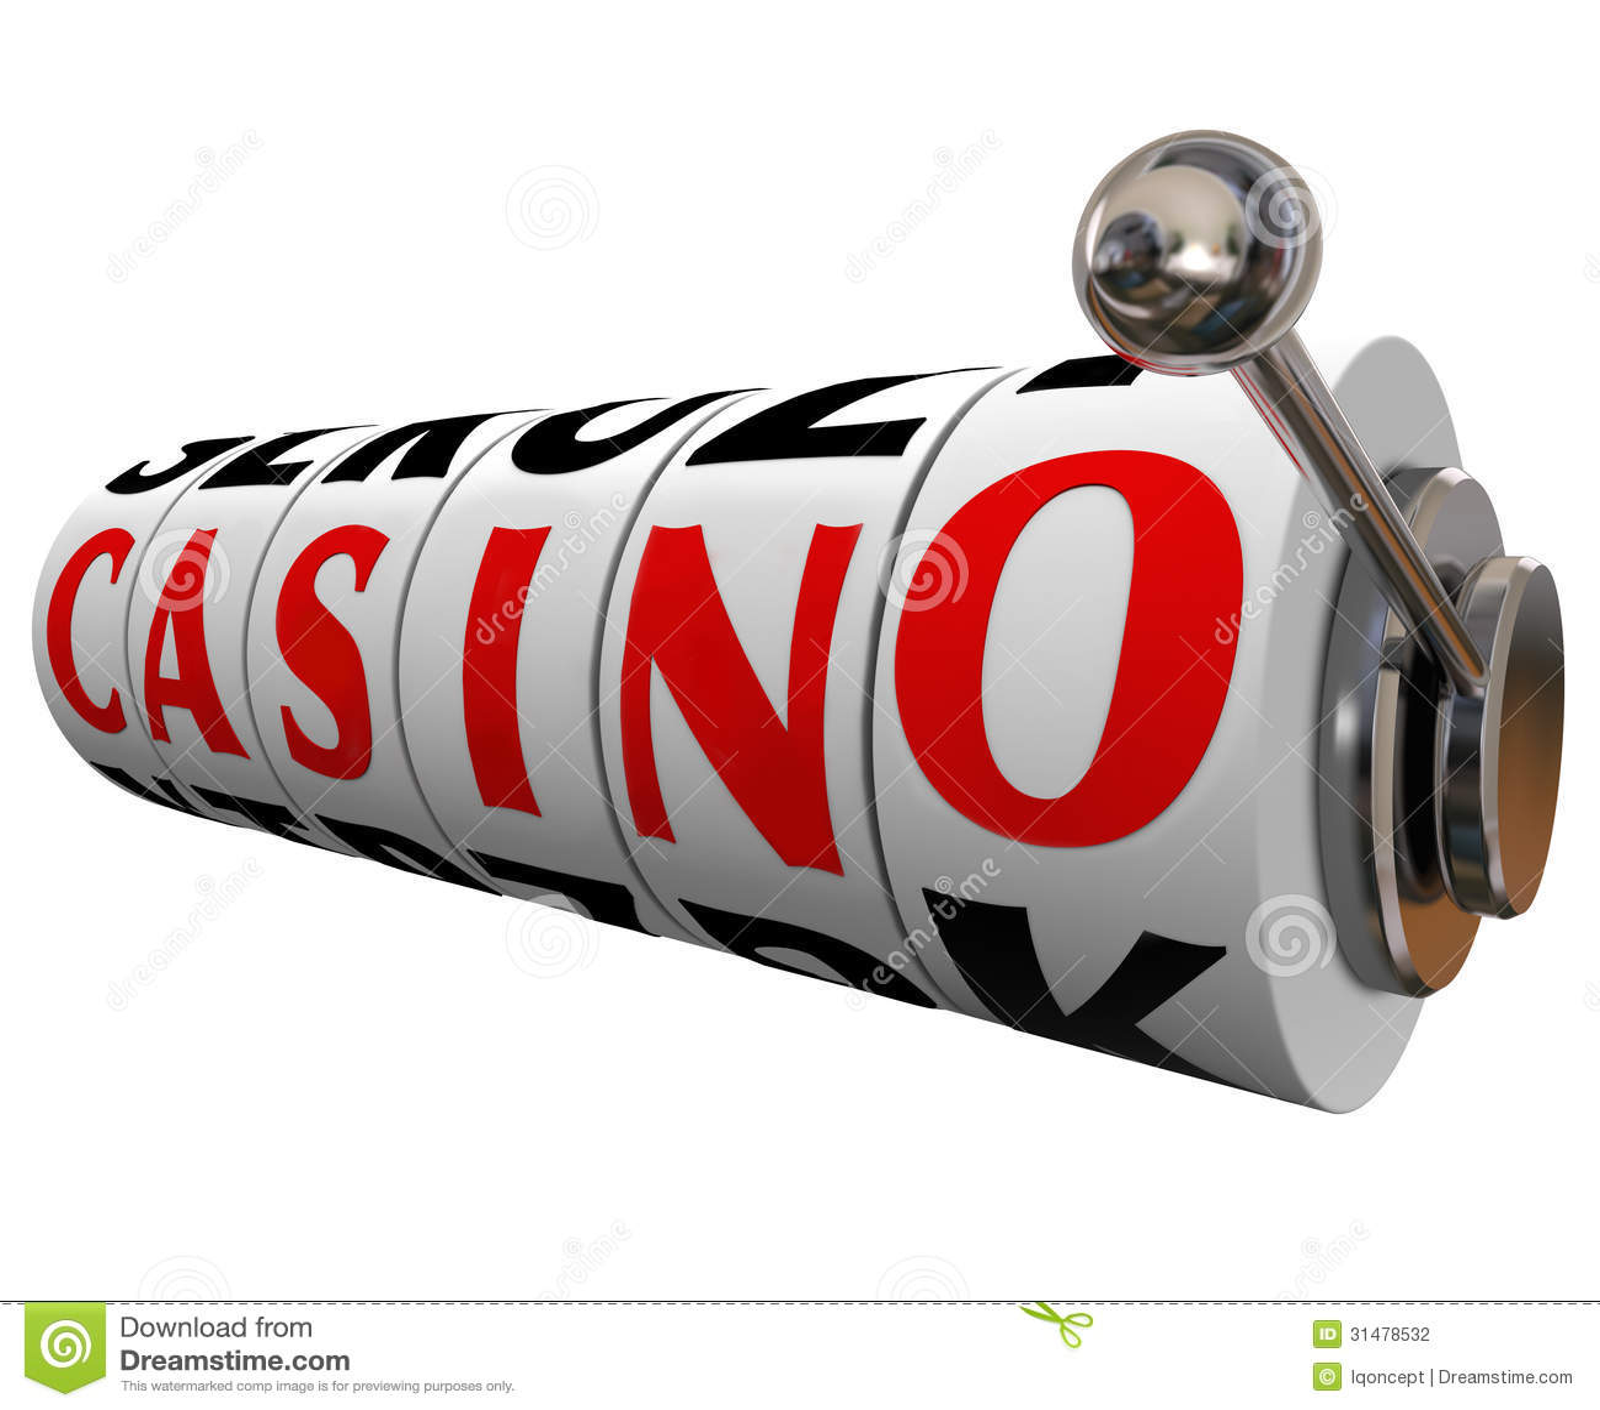 star casino online online ra